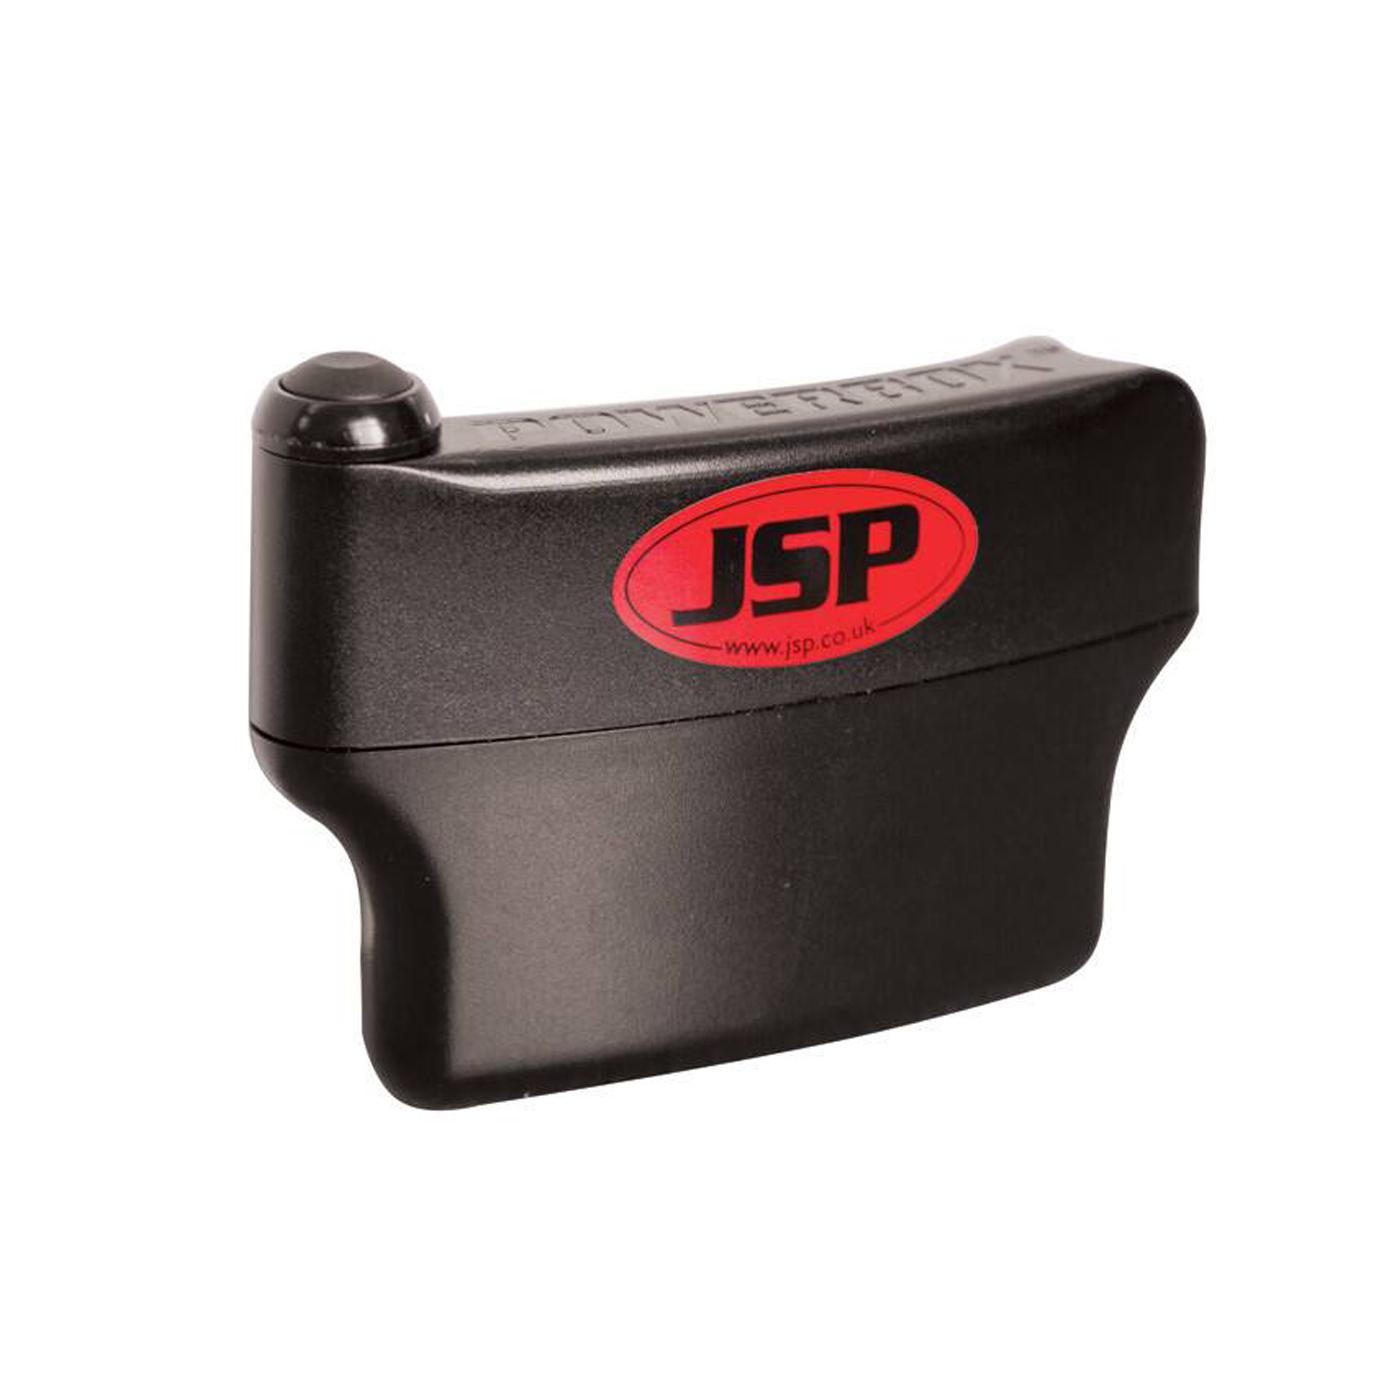 Bateria do PowerCap® Active™ JSP CAU340-001-100